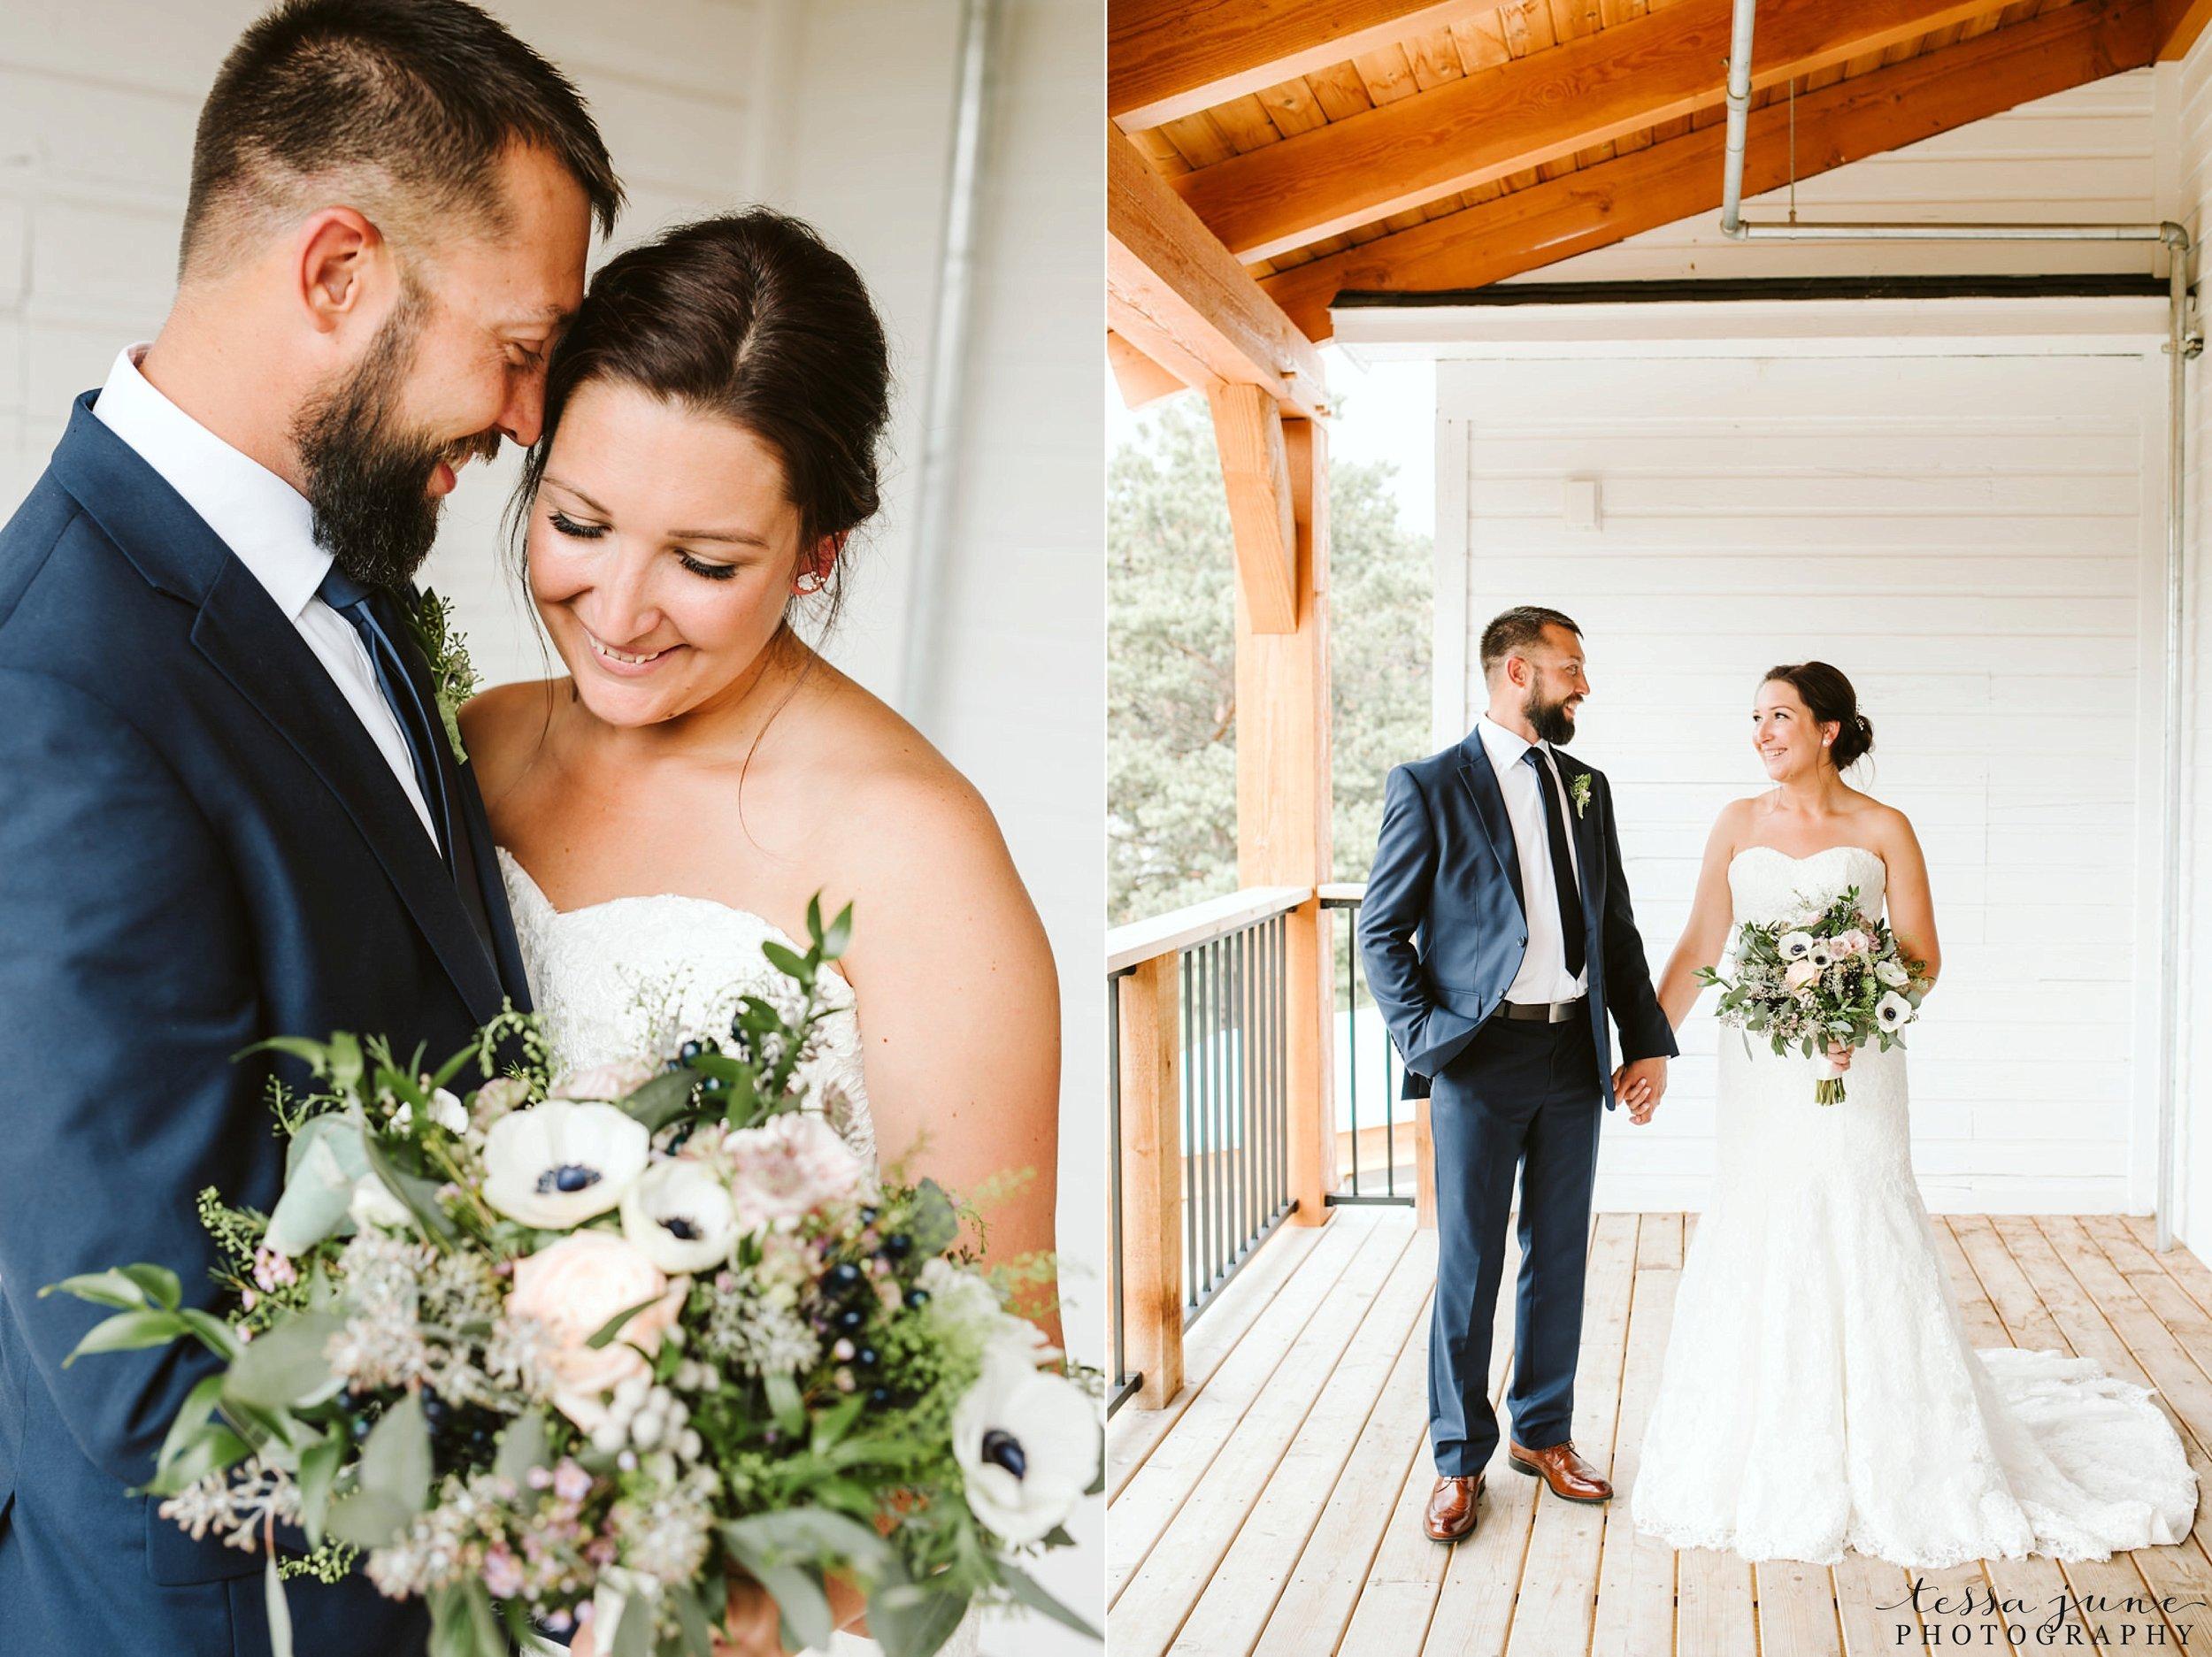 gathered-oaks-barn-wedding-alexandria-minnesota-28.jpg